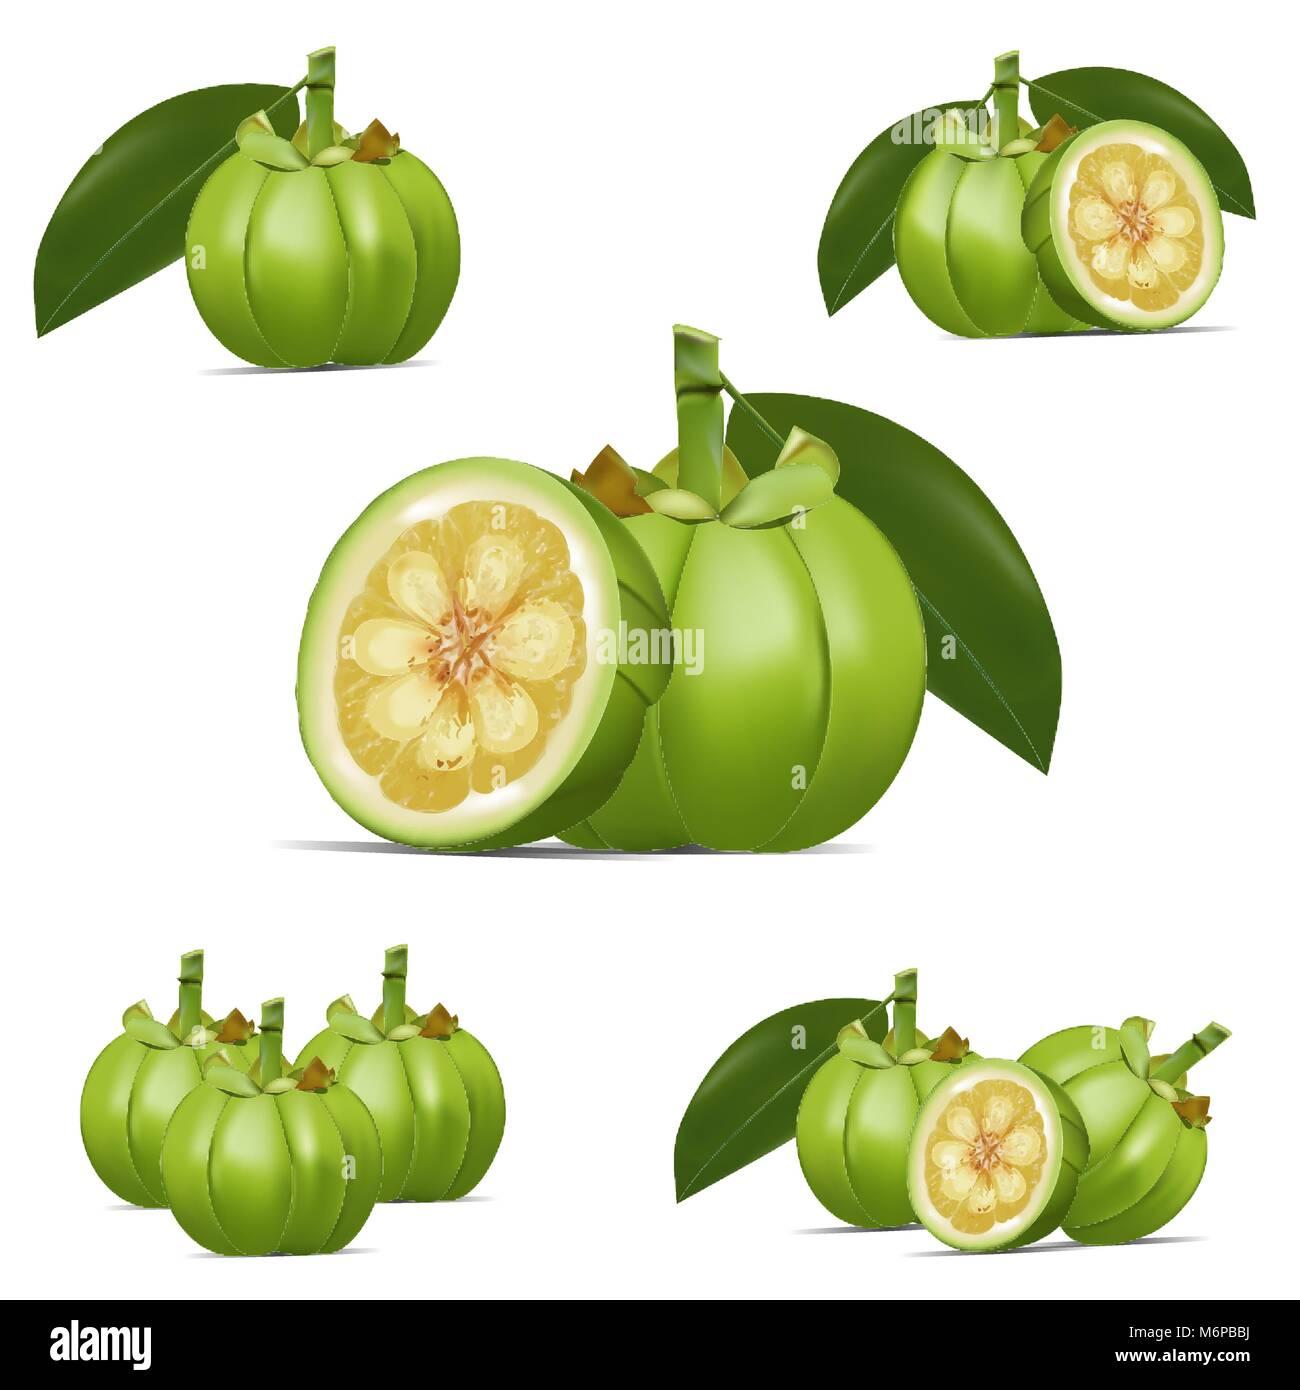 Garcinia Cambogia Fruit Vector Stock Vector Art Illustration